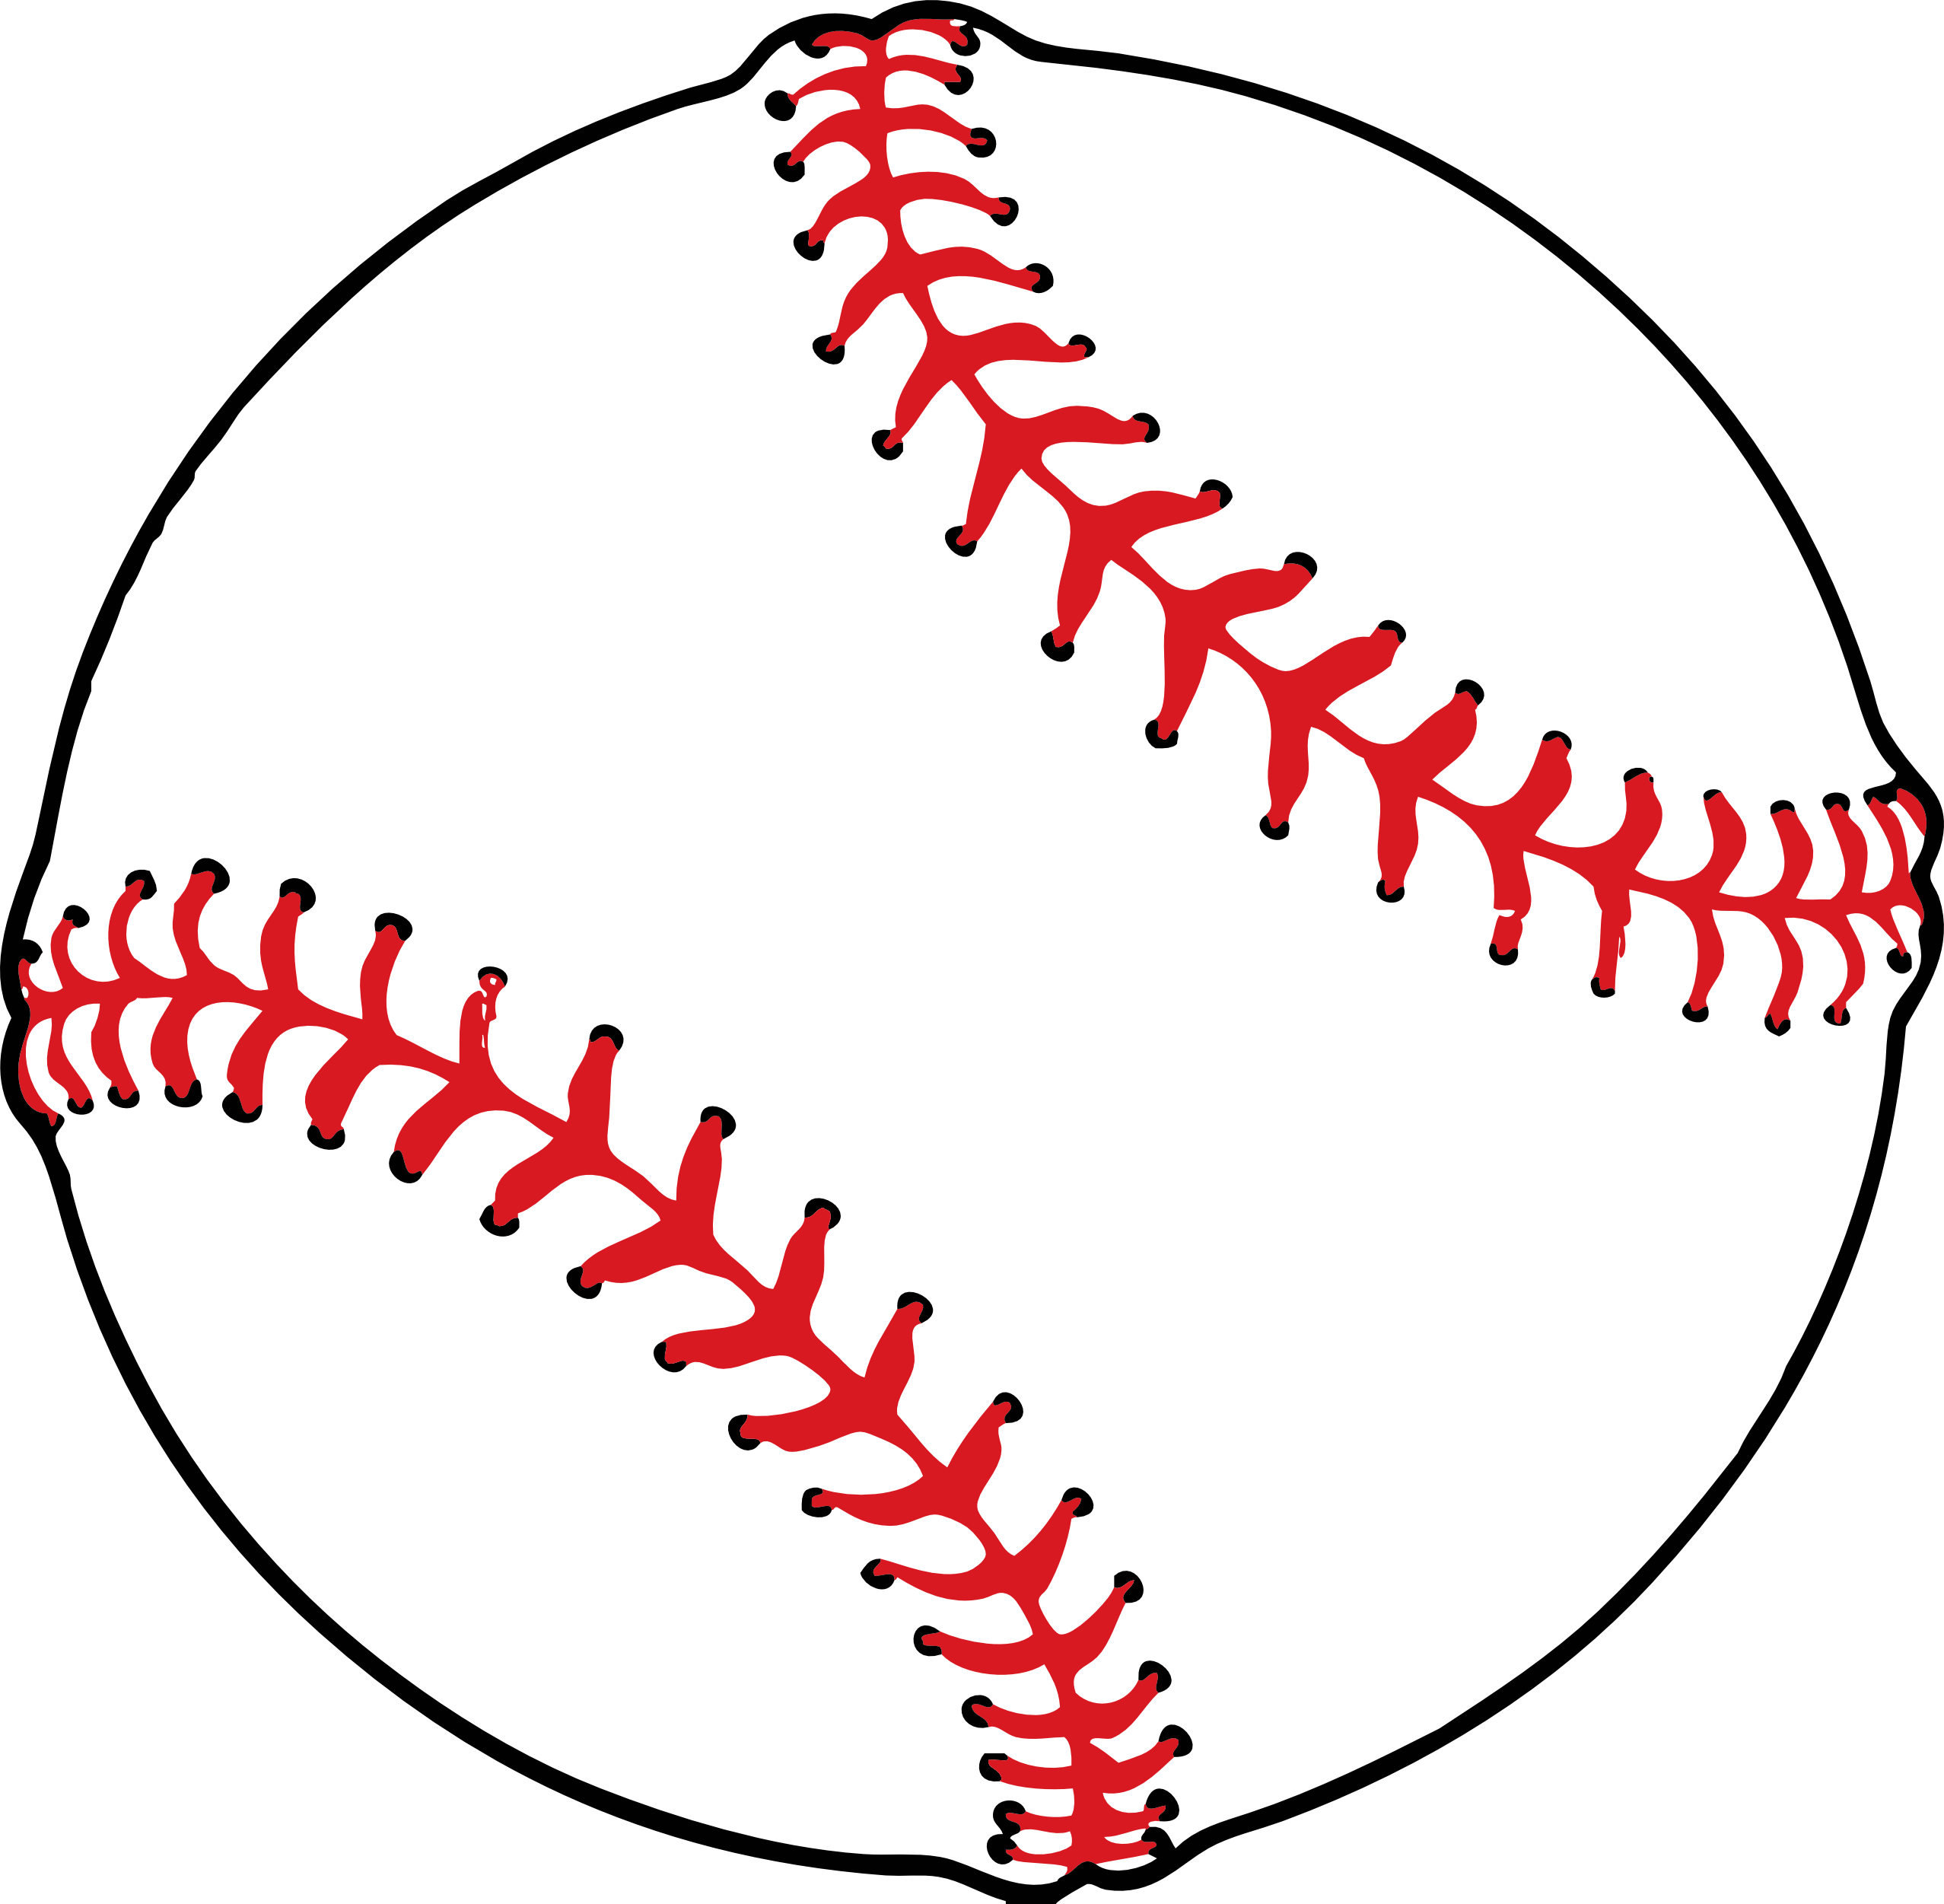 Free Baseball Ball Clipart, Download Free Clip Art, Free Clip Art on.